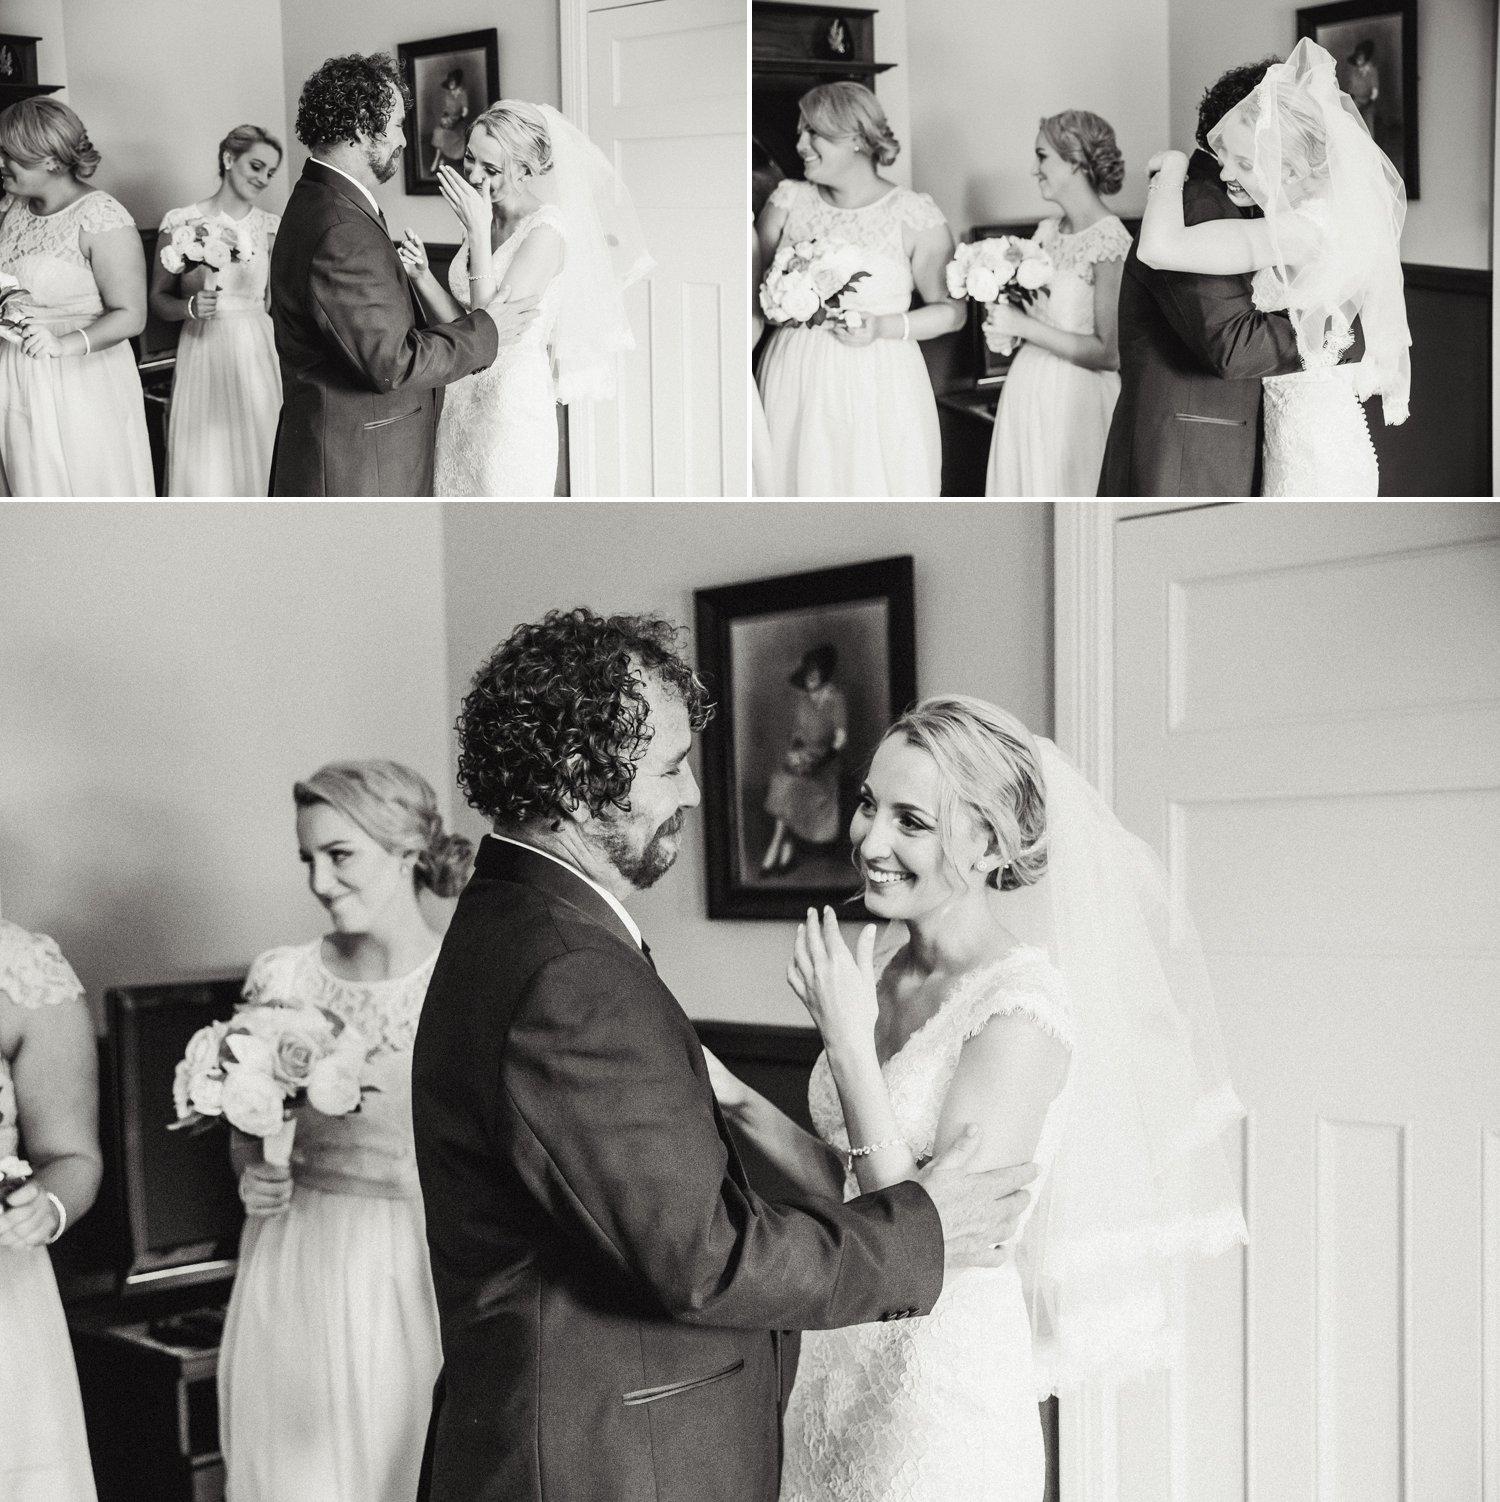 Phoebe & Brenton_Narrabri Wedding Photography 9.jpg